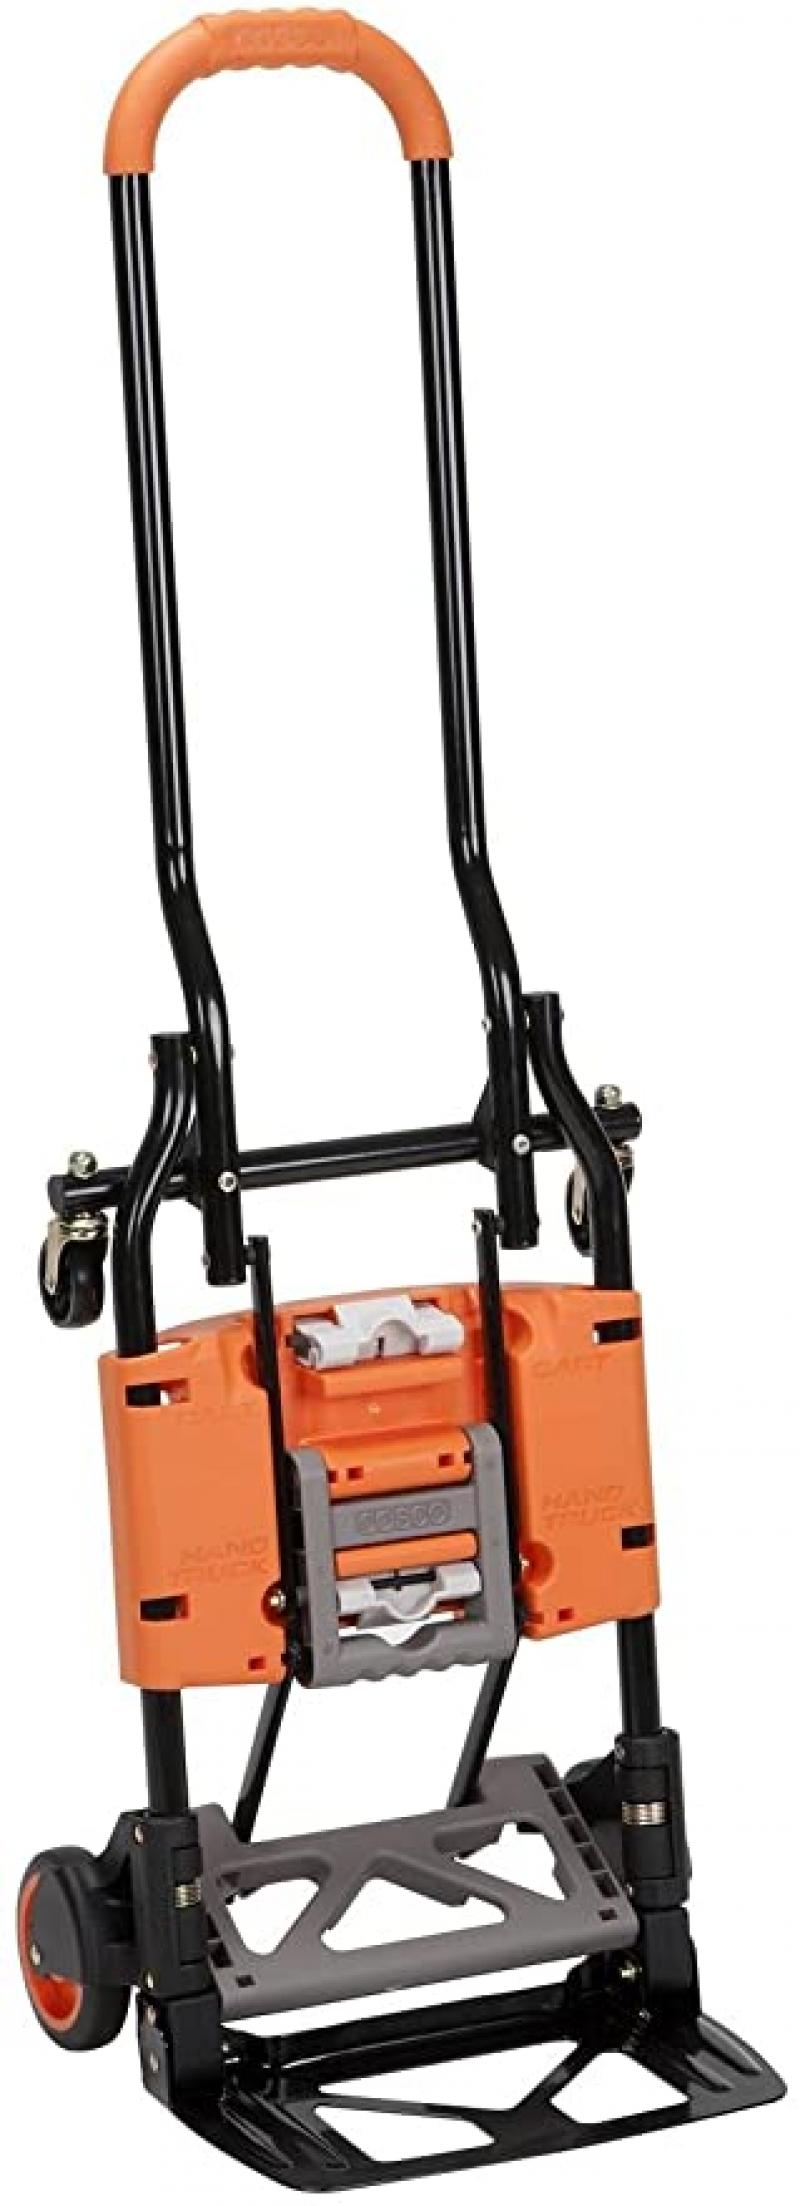 ihocon: Cosco Shifter 300-Pound Capacity Multi-Position Folding Hand Truck and Cart 折疊載物推車